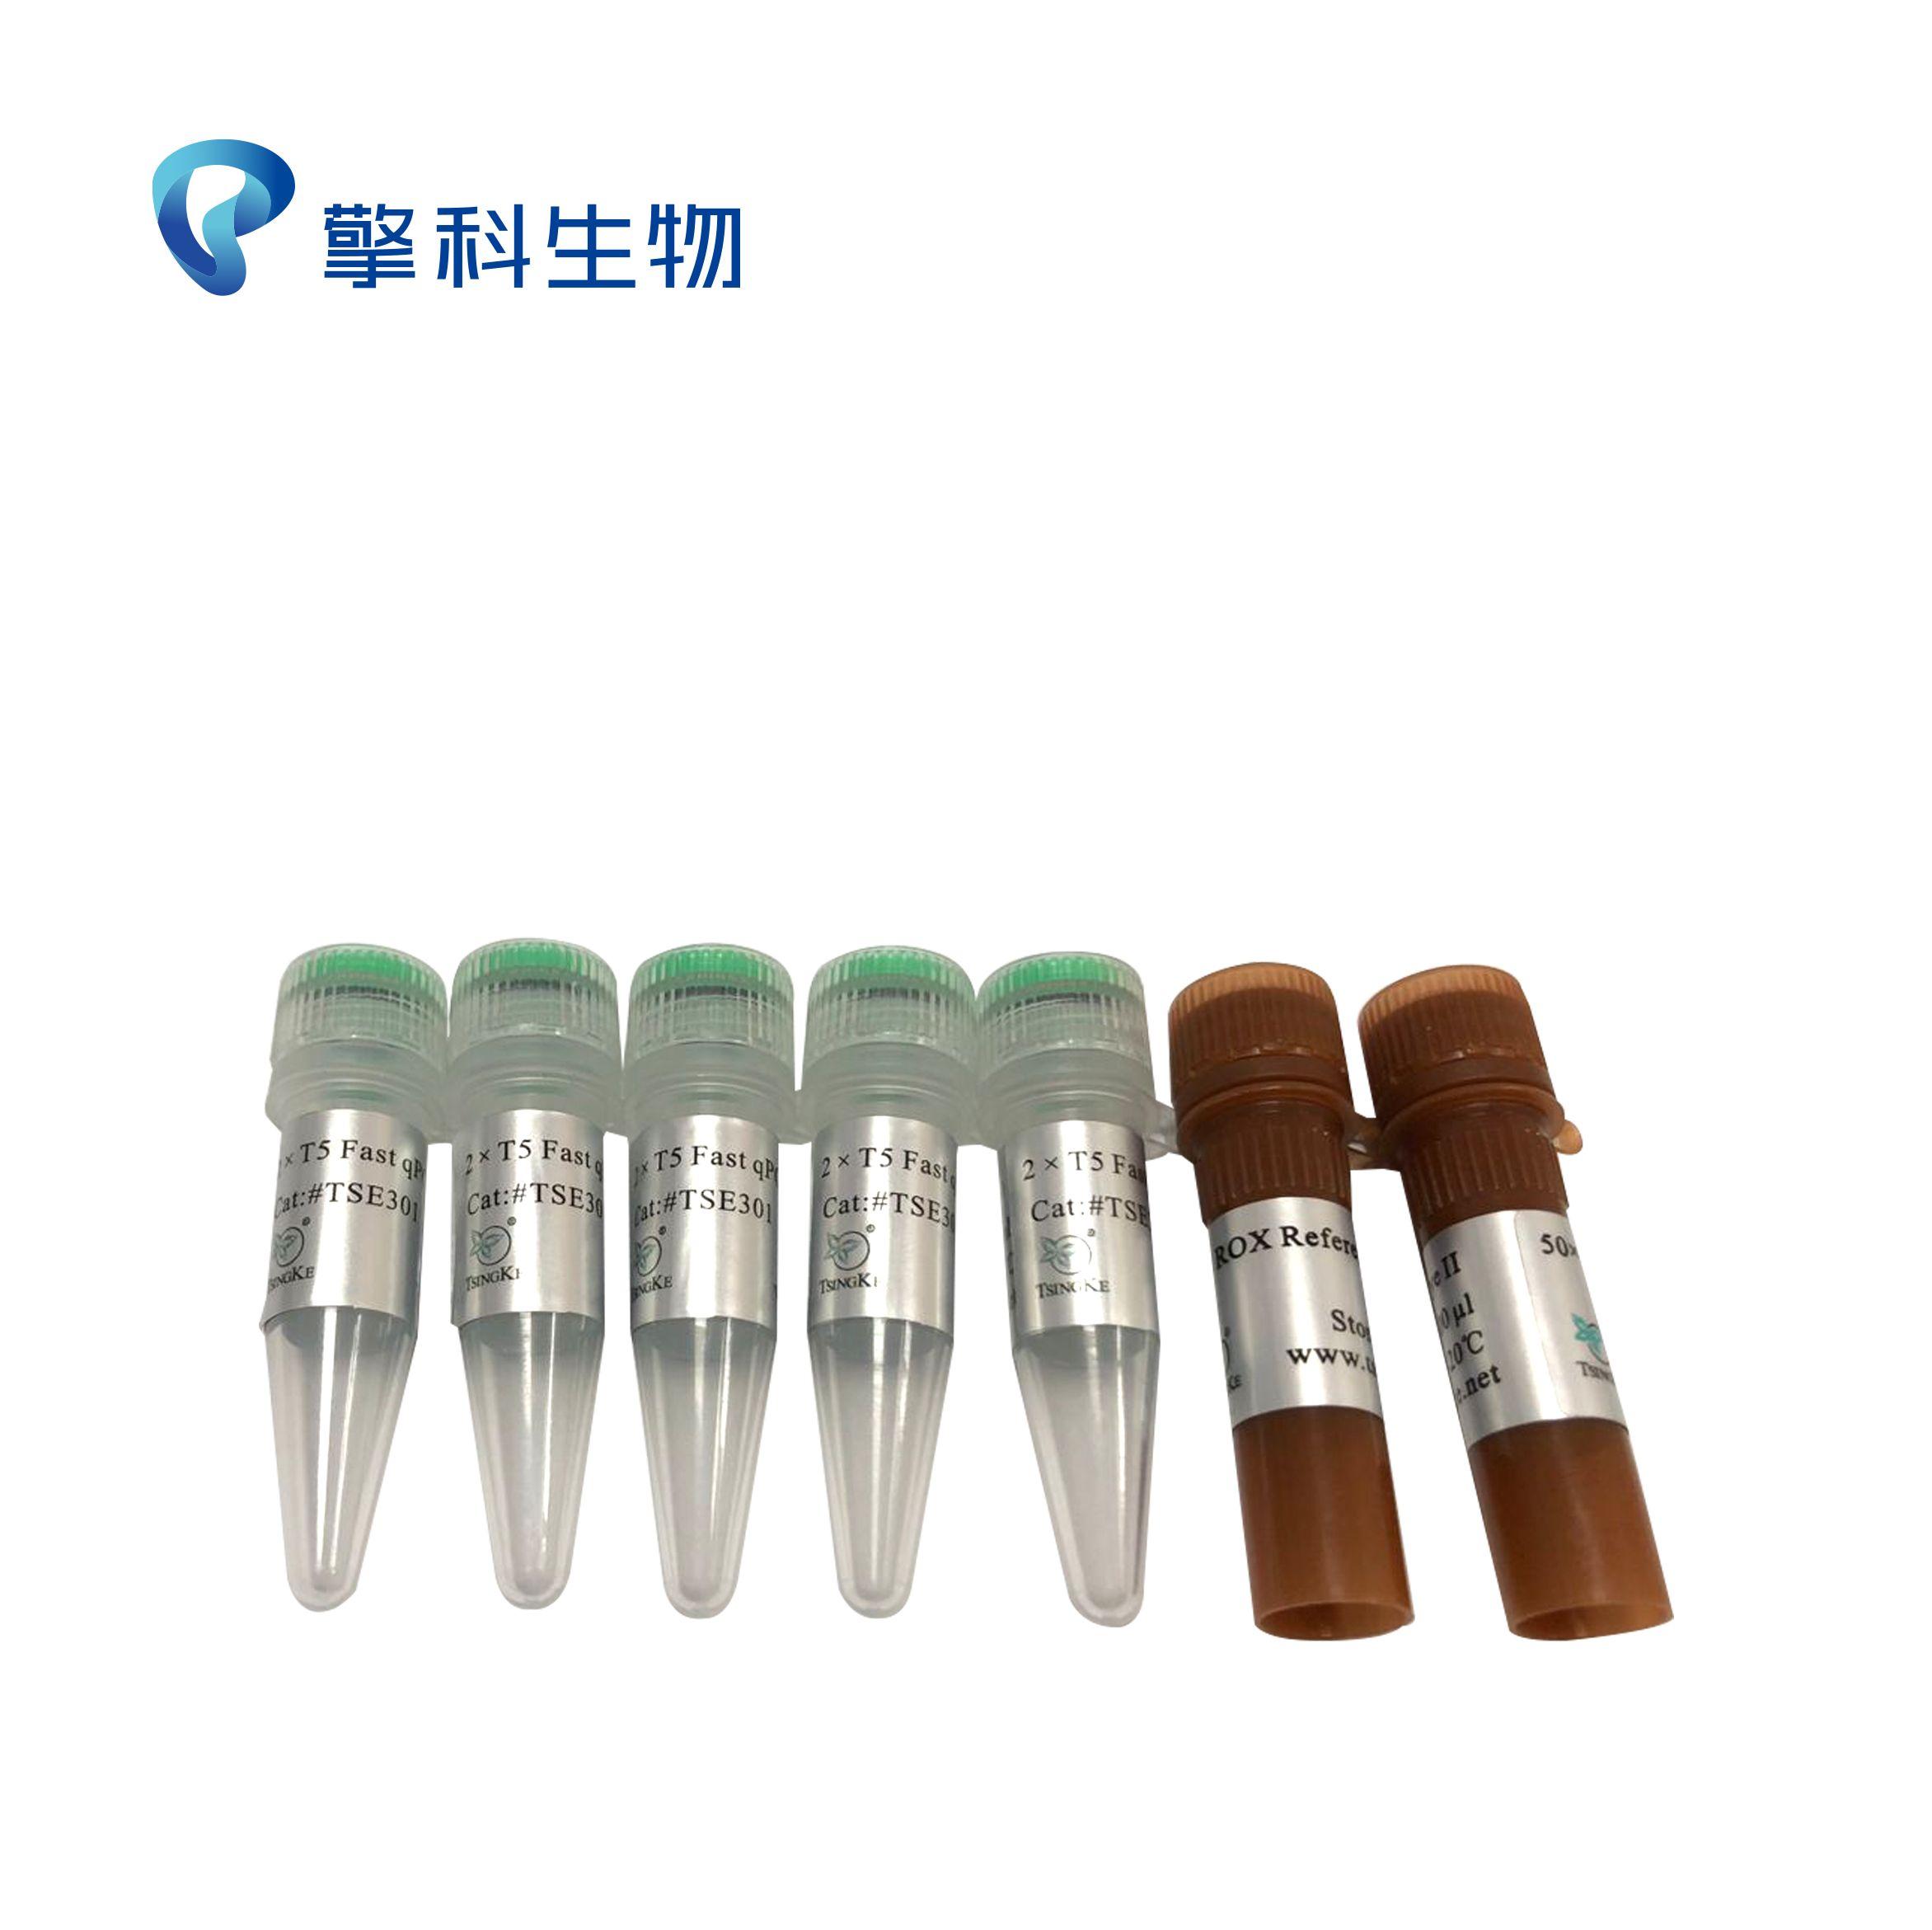 2×T5 Fast qPCR Mix(Probe)/快速耐脏型探针法专用试剂/荧光定量系列/擎科生物TSINGKE